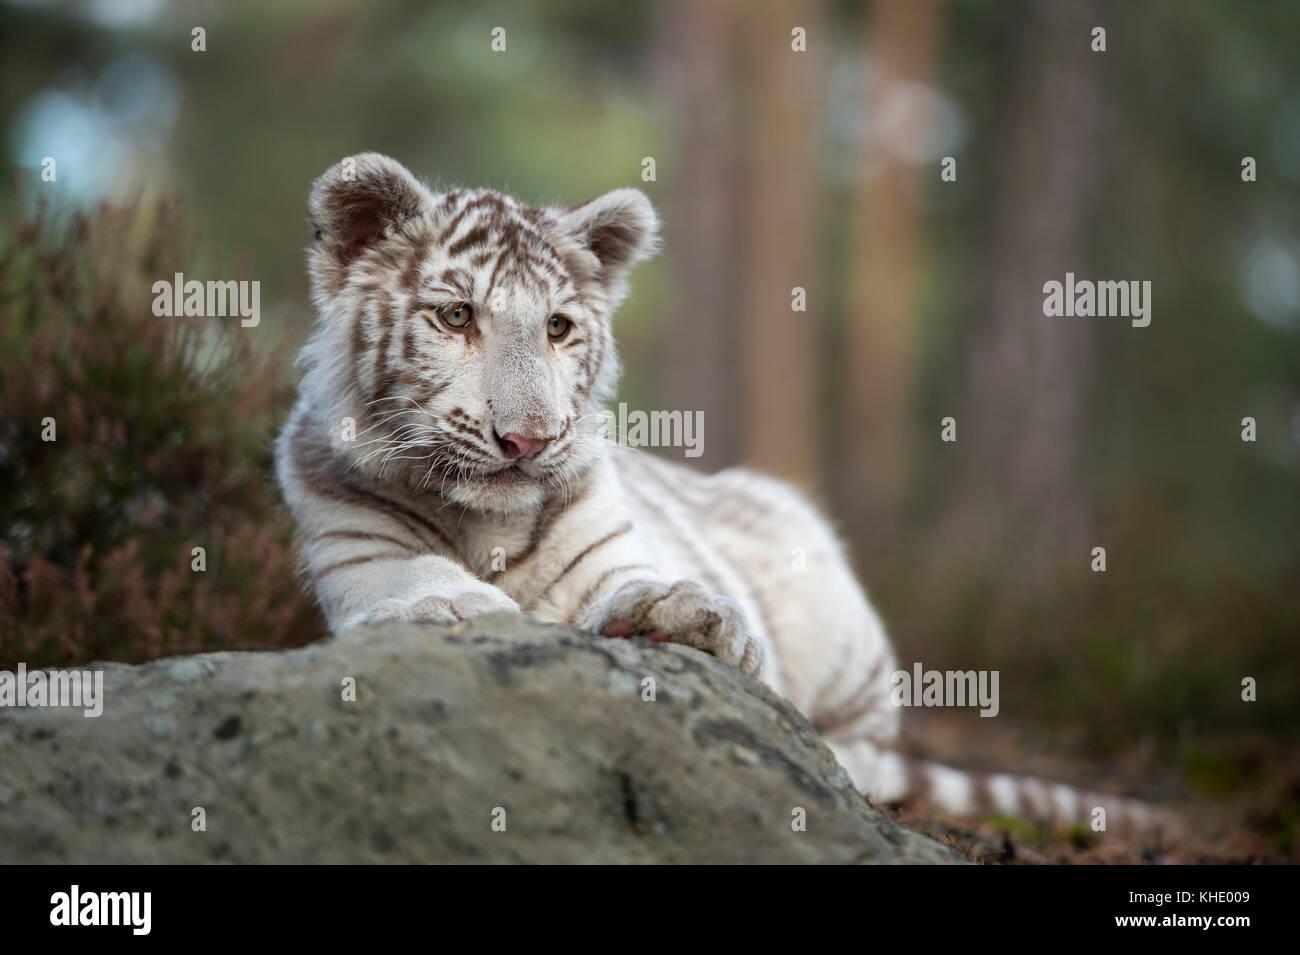 Bengal Tiger / Koenigstiger ( Panthera tigris ), young cub, white leucistic morph, lying on rocks, resting, watching - Stock Image